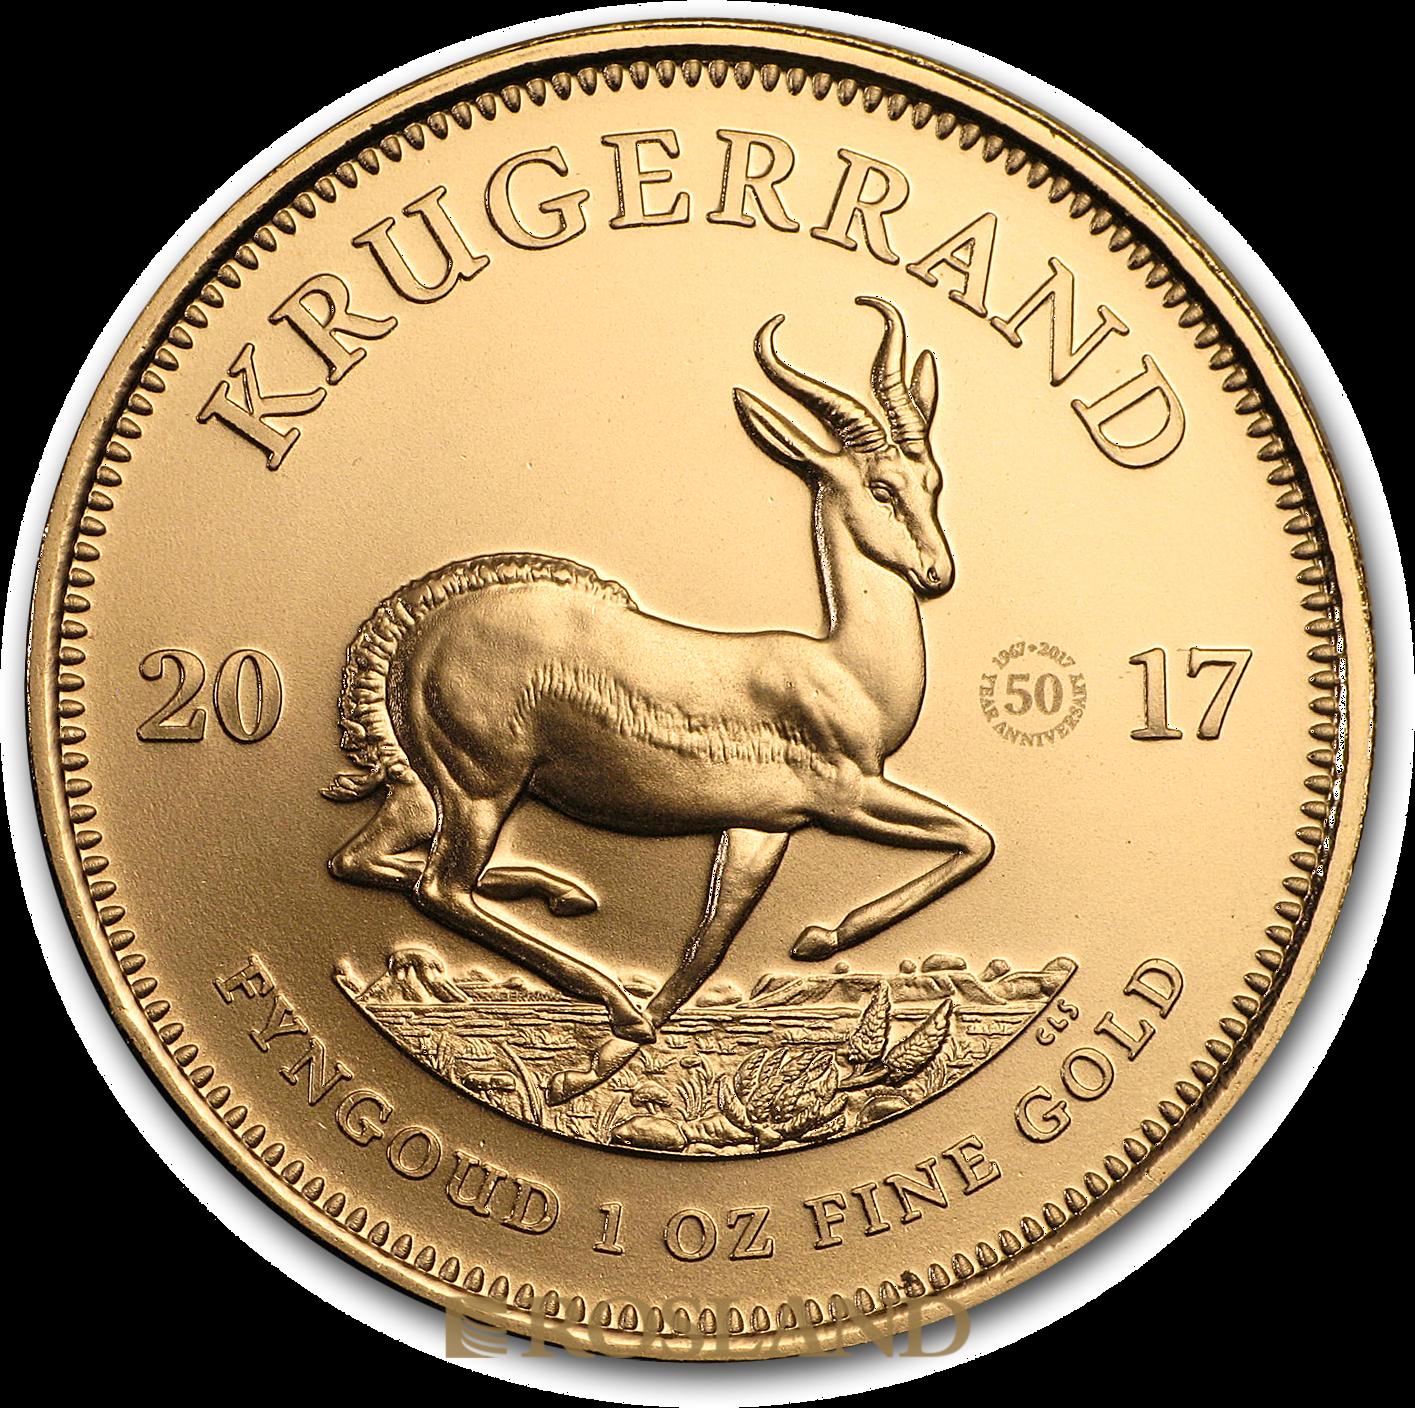 1 Unze Goldmünze Krügerrand 50 Jahre Jubiläum 2017